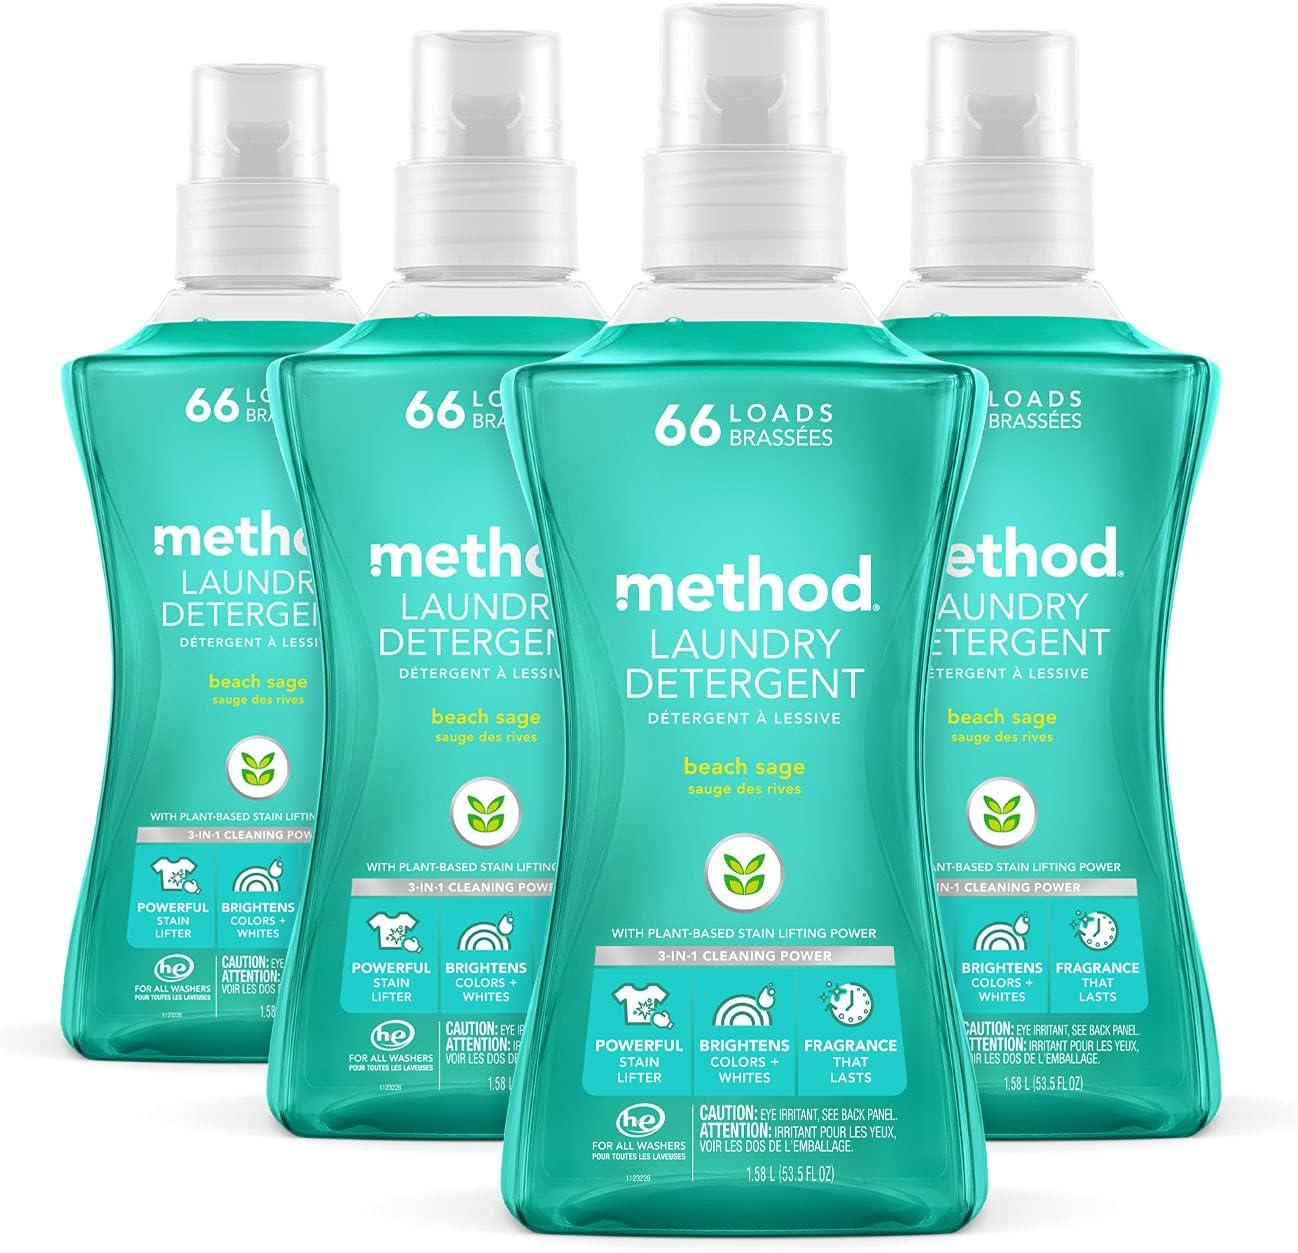 Method Liquid Max 48% Award-winning store OFF Laundry Detergent + Hypoallergenic Biodegradable